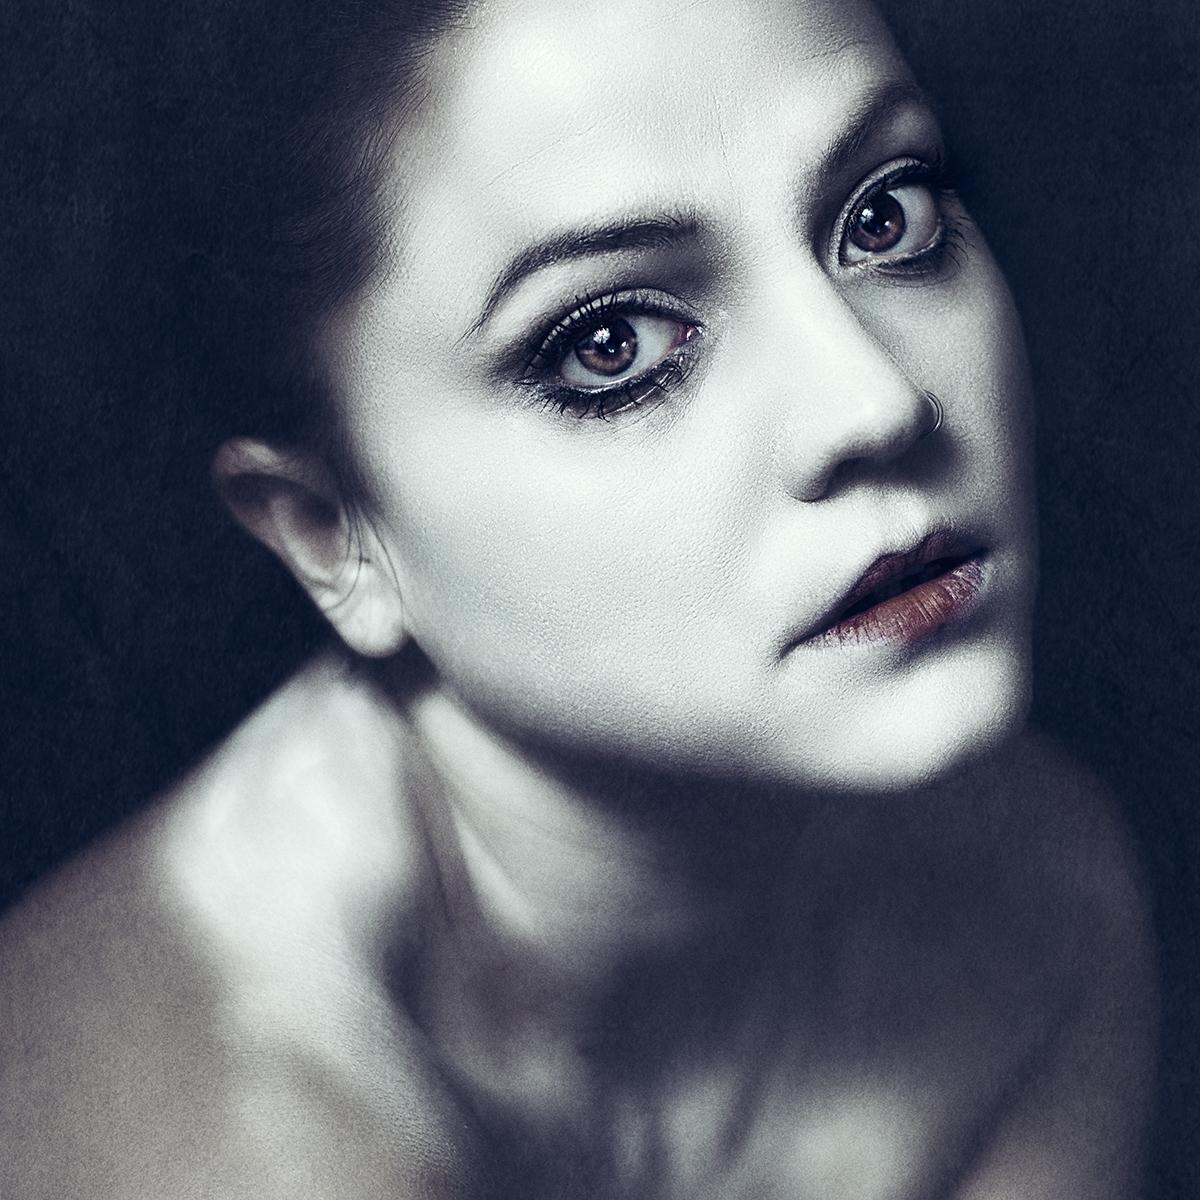 Elena Bovo (elenabovoartist tb elenabovo tw BovoElena) - Anna Ave (AAnna-Make-Up-1187526421275242).jpg